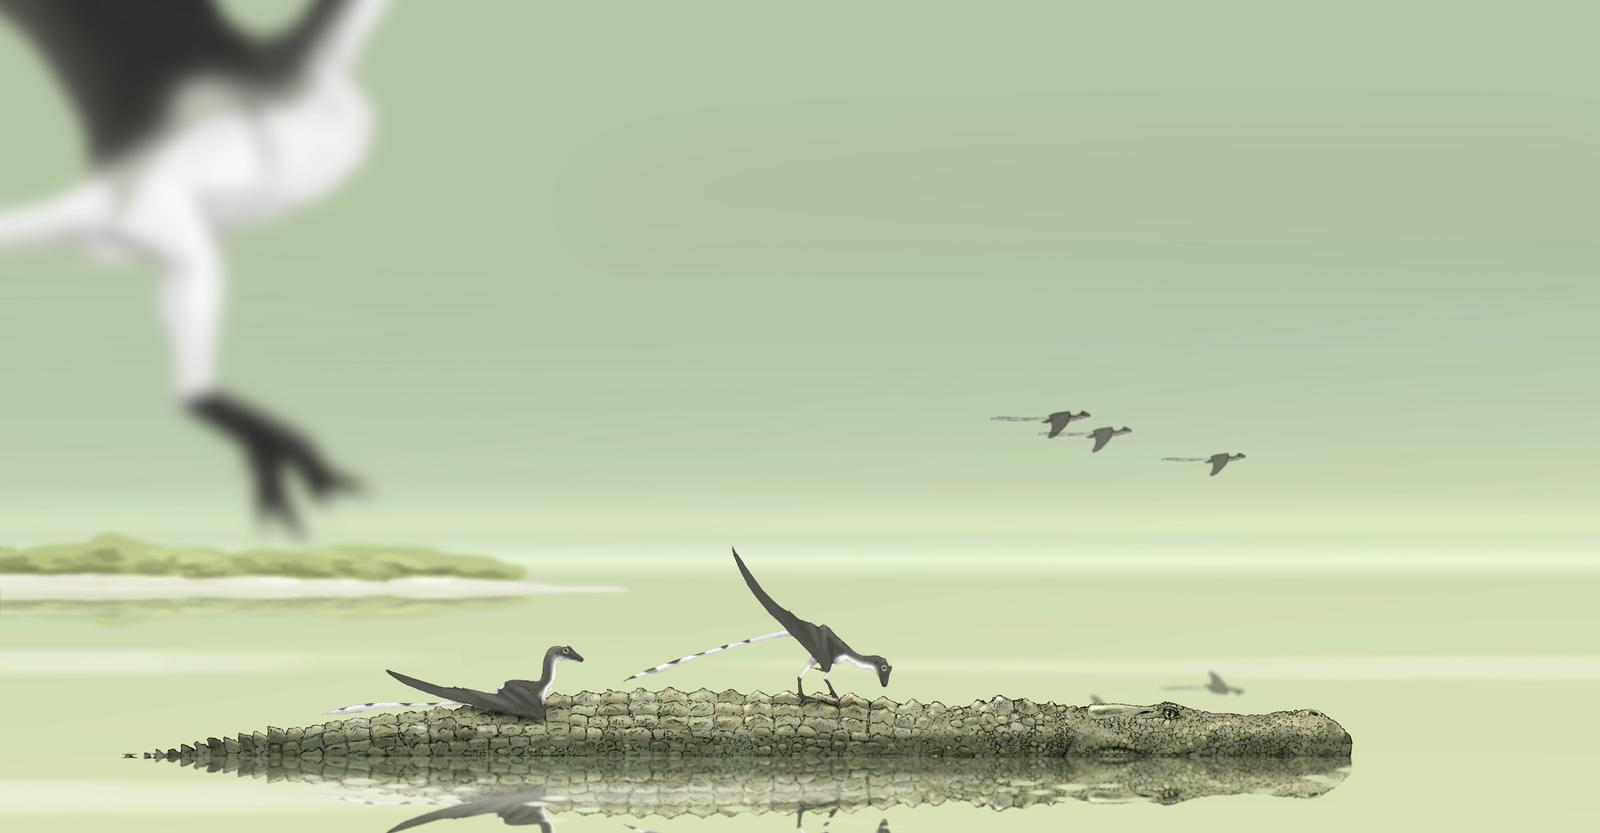 South america, 12 million years ago